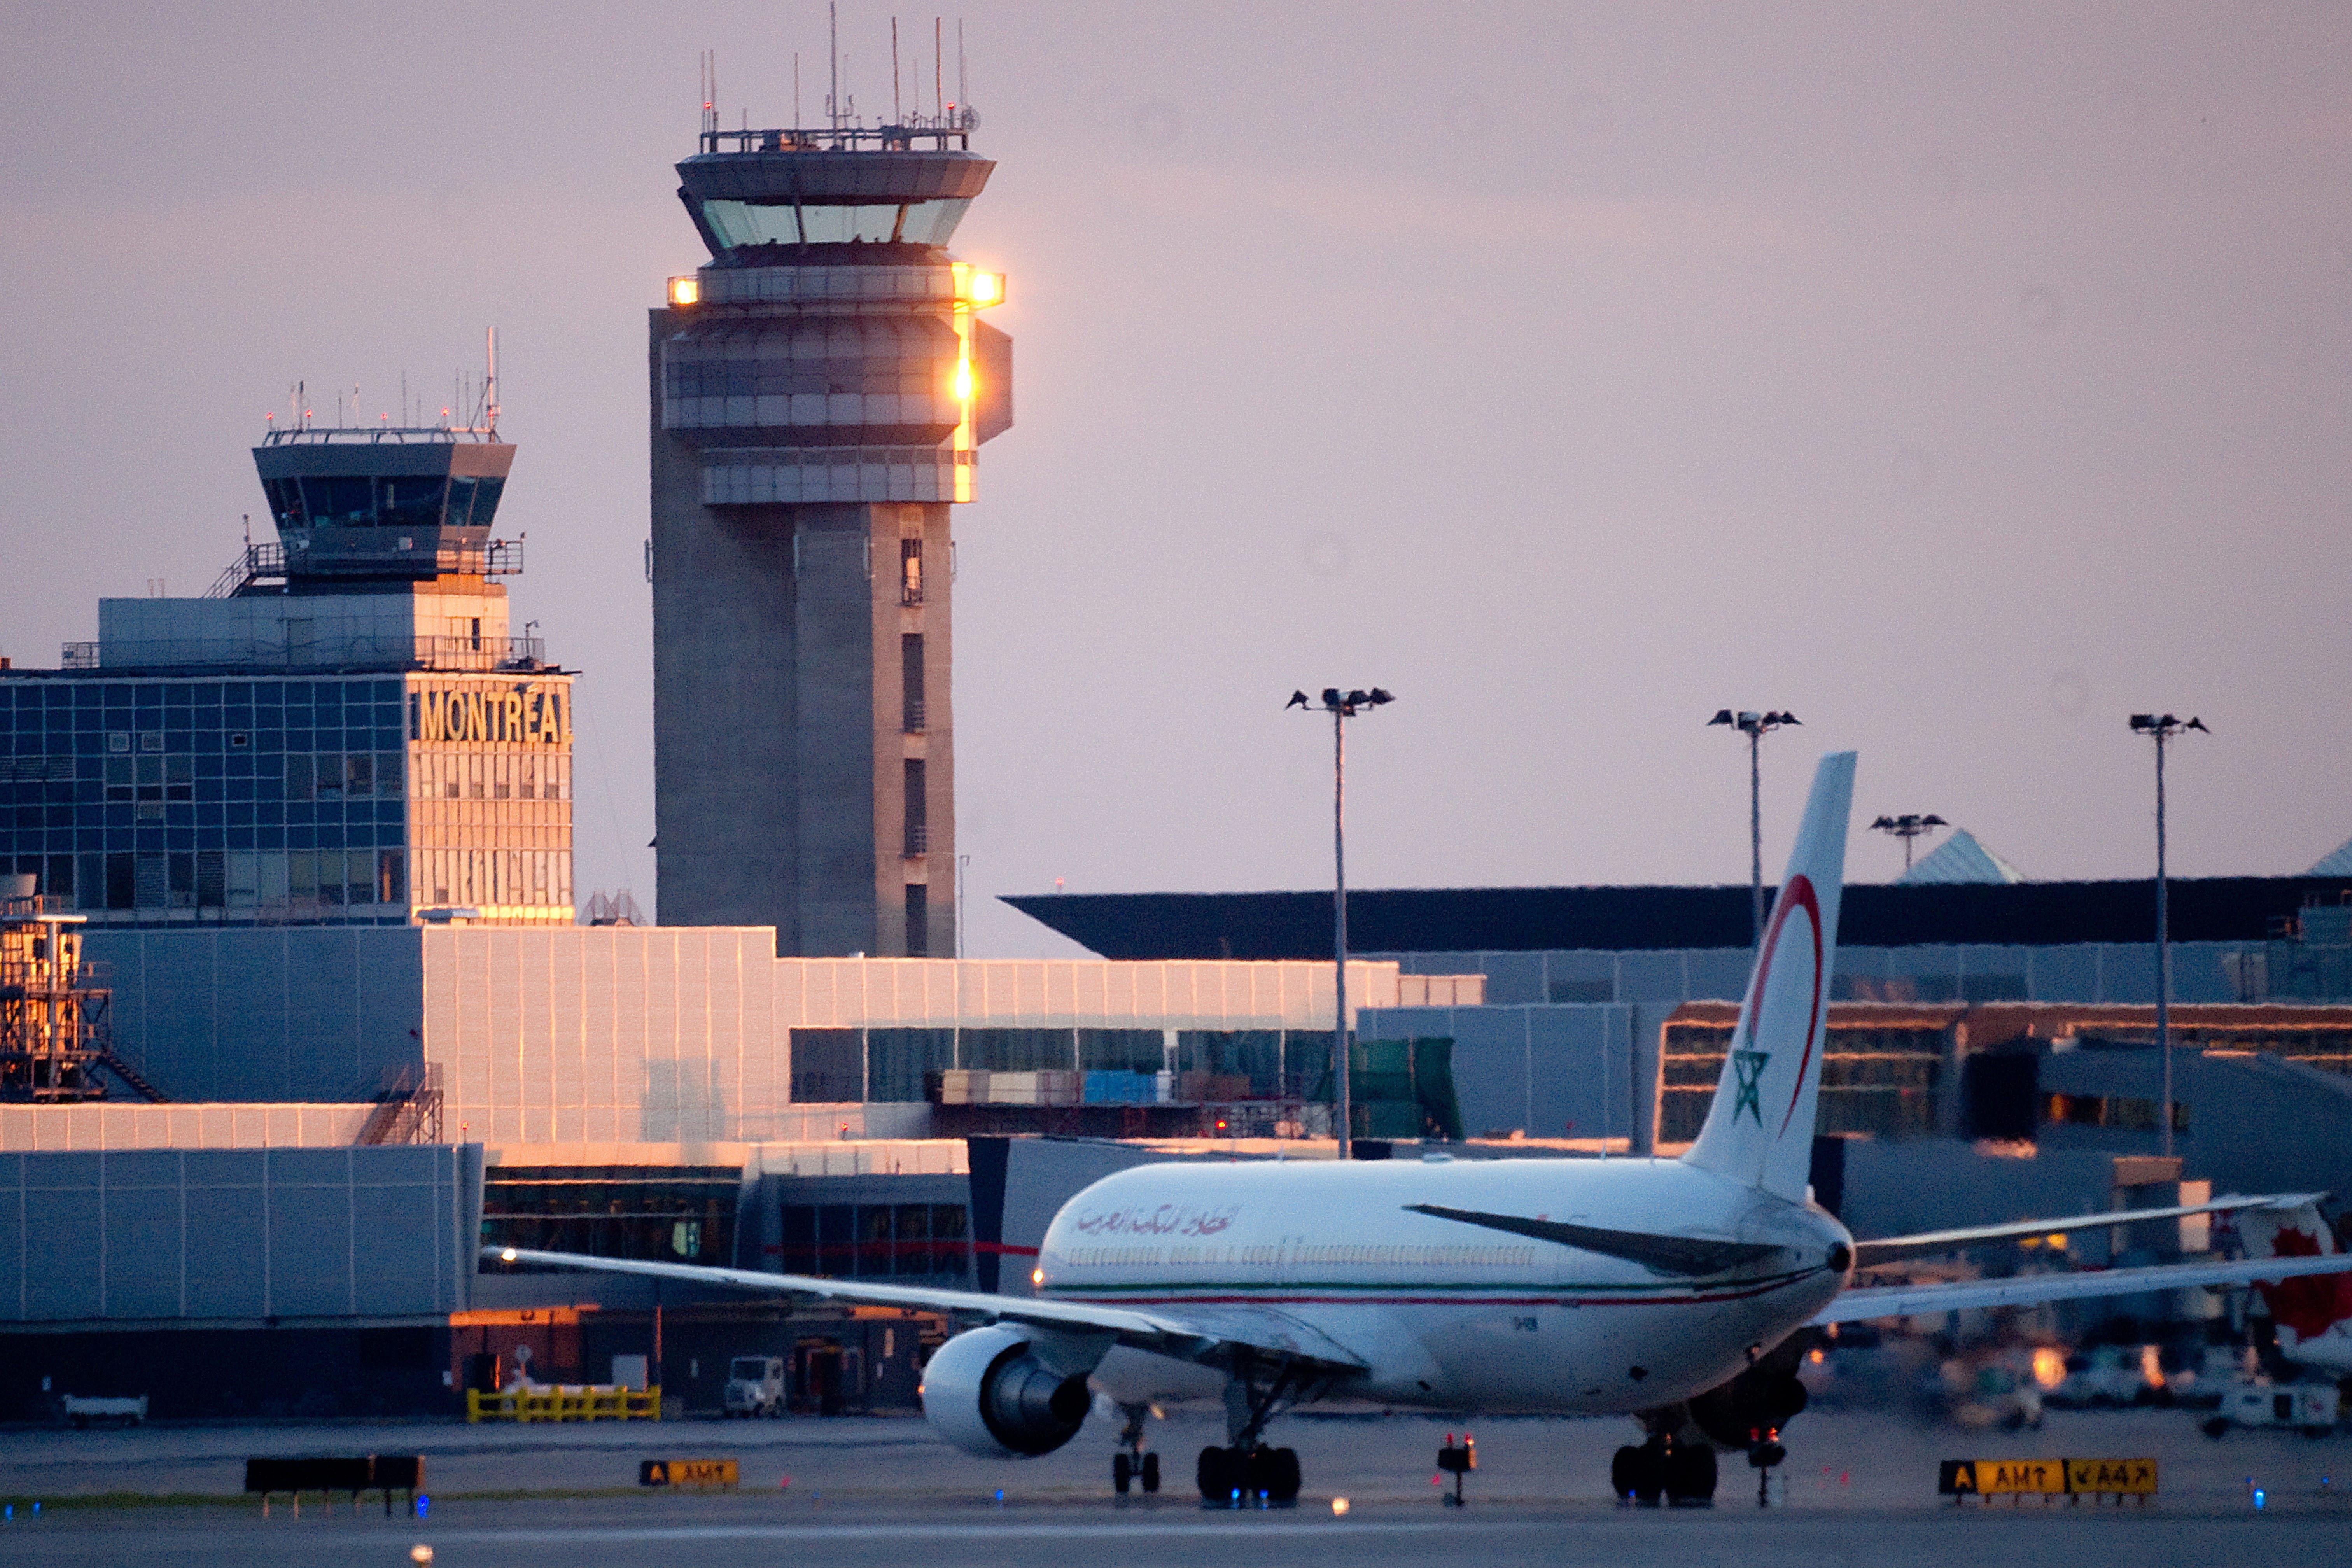 trudeau airport passport control kiosks